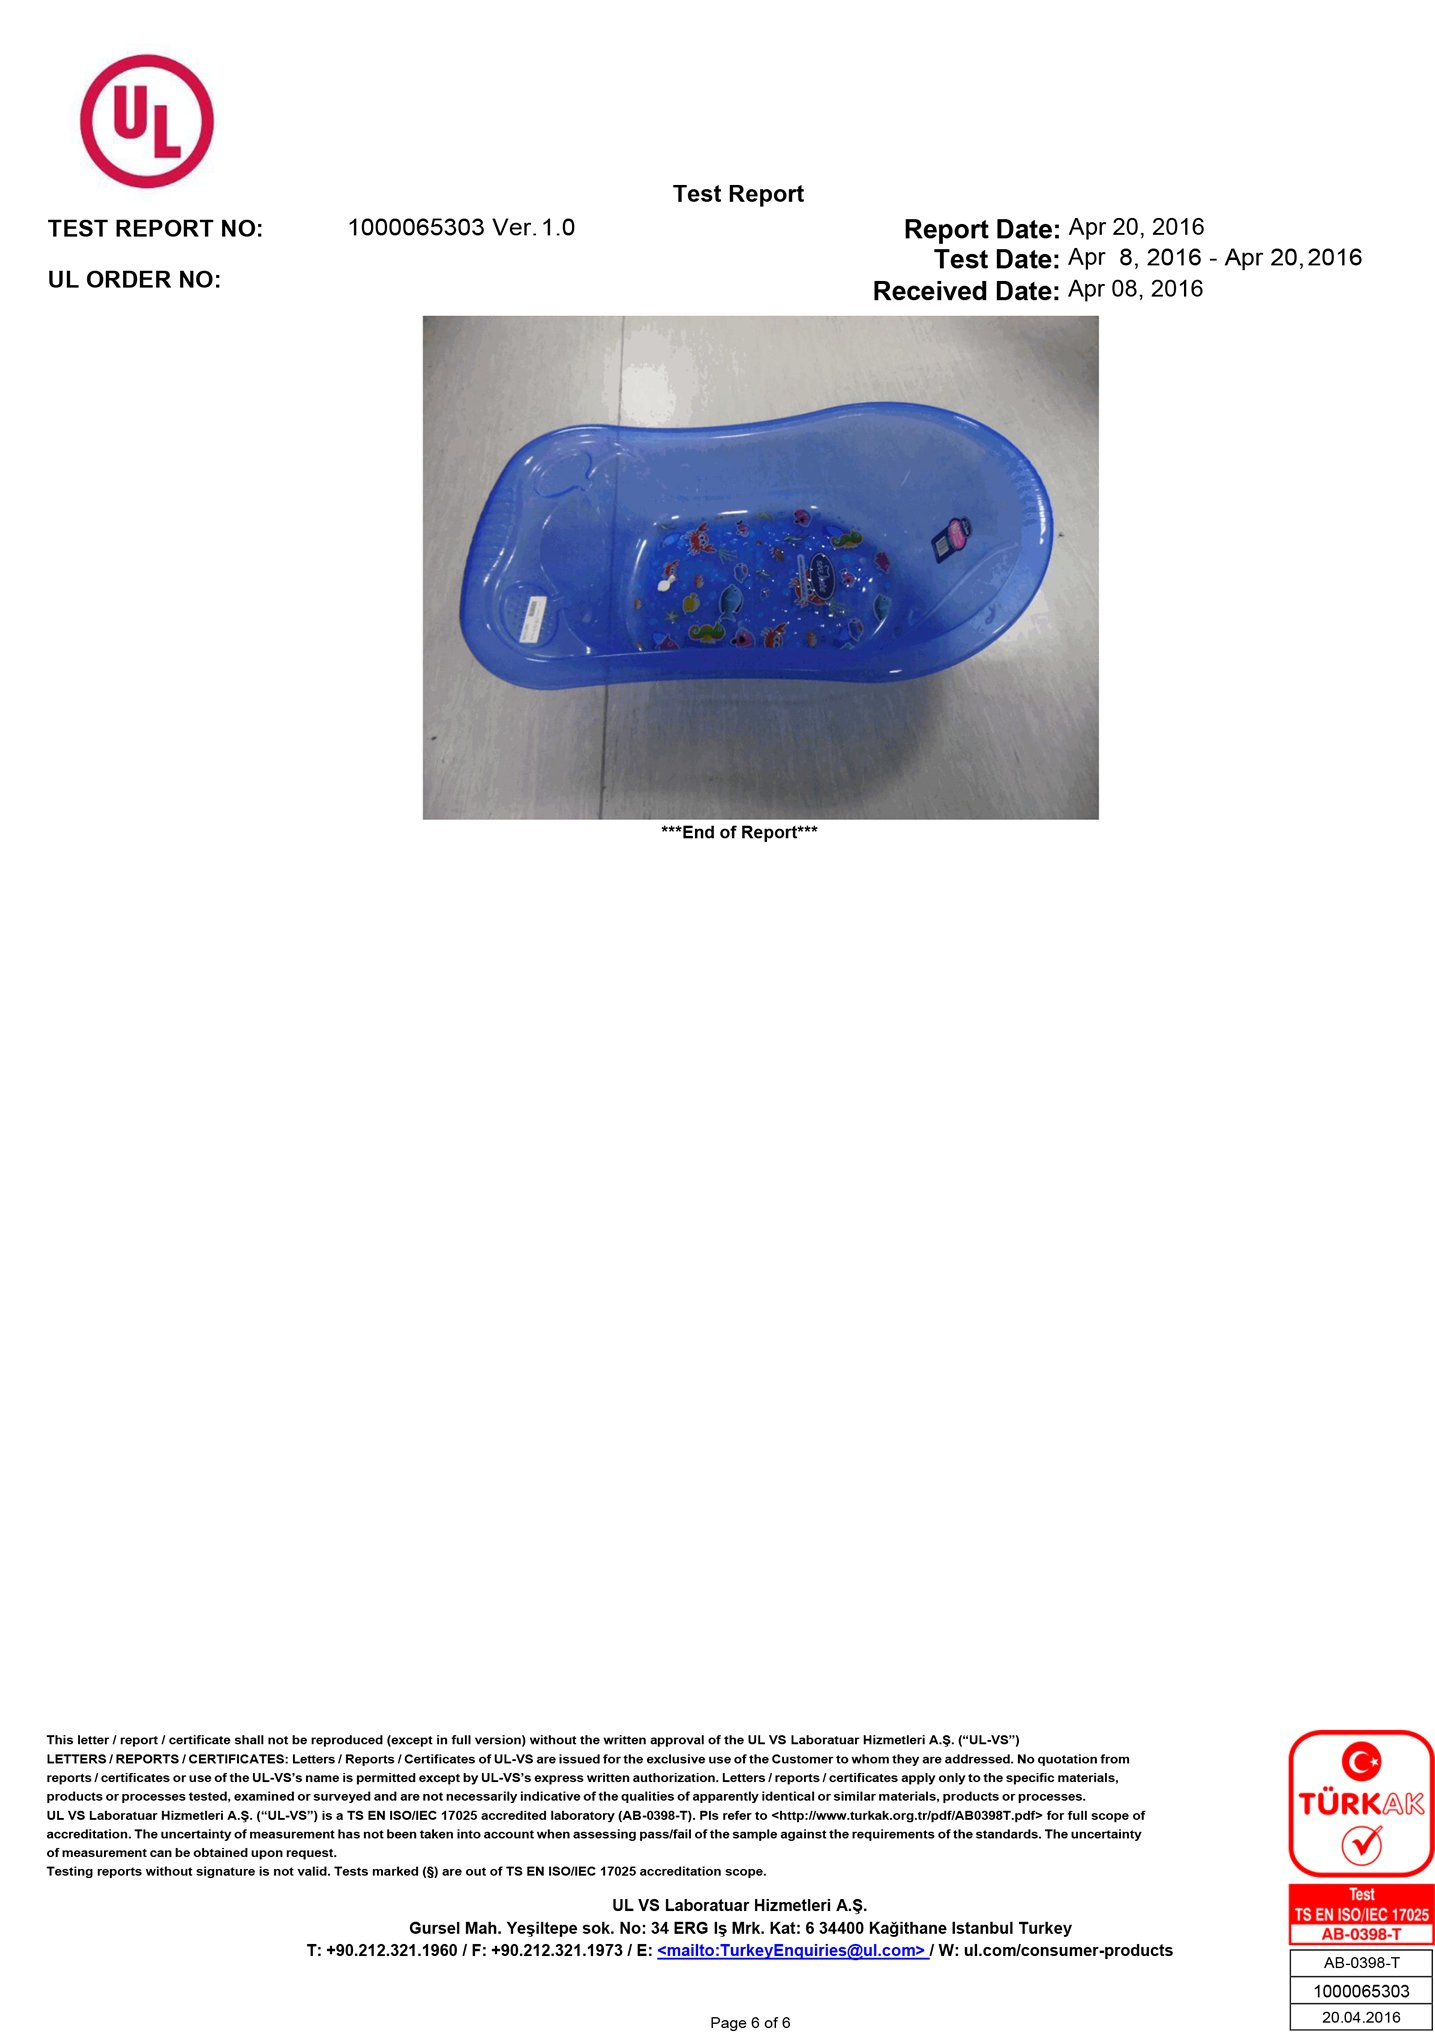 Desenli Giderli Şeffaf Banyo Küveti Test Raporu 6